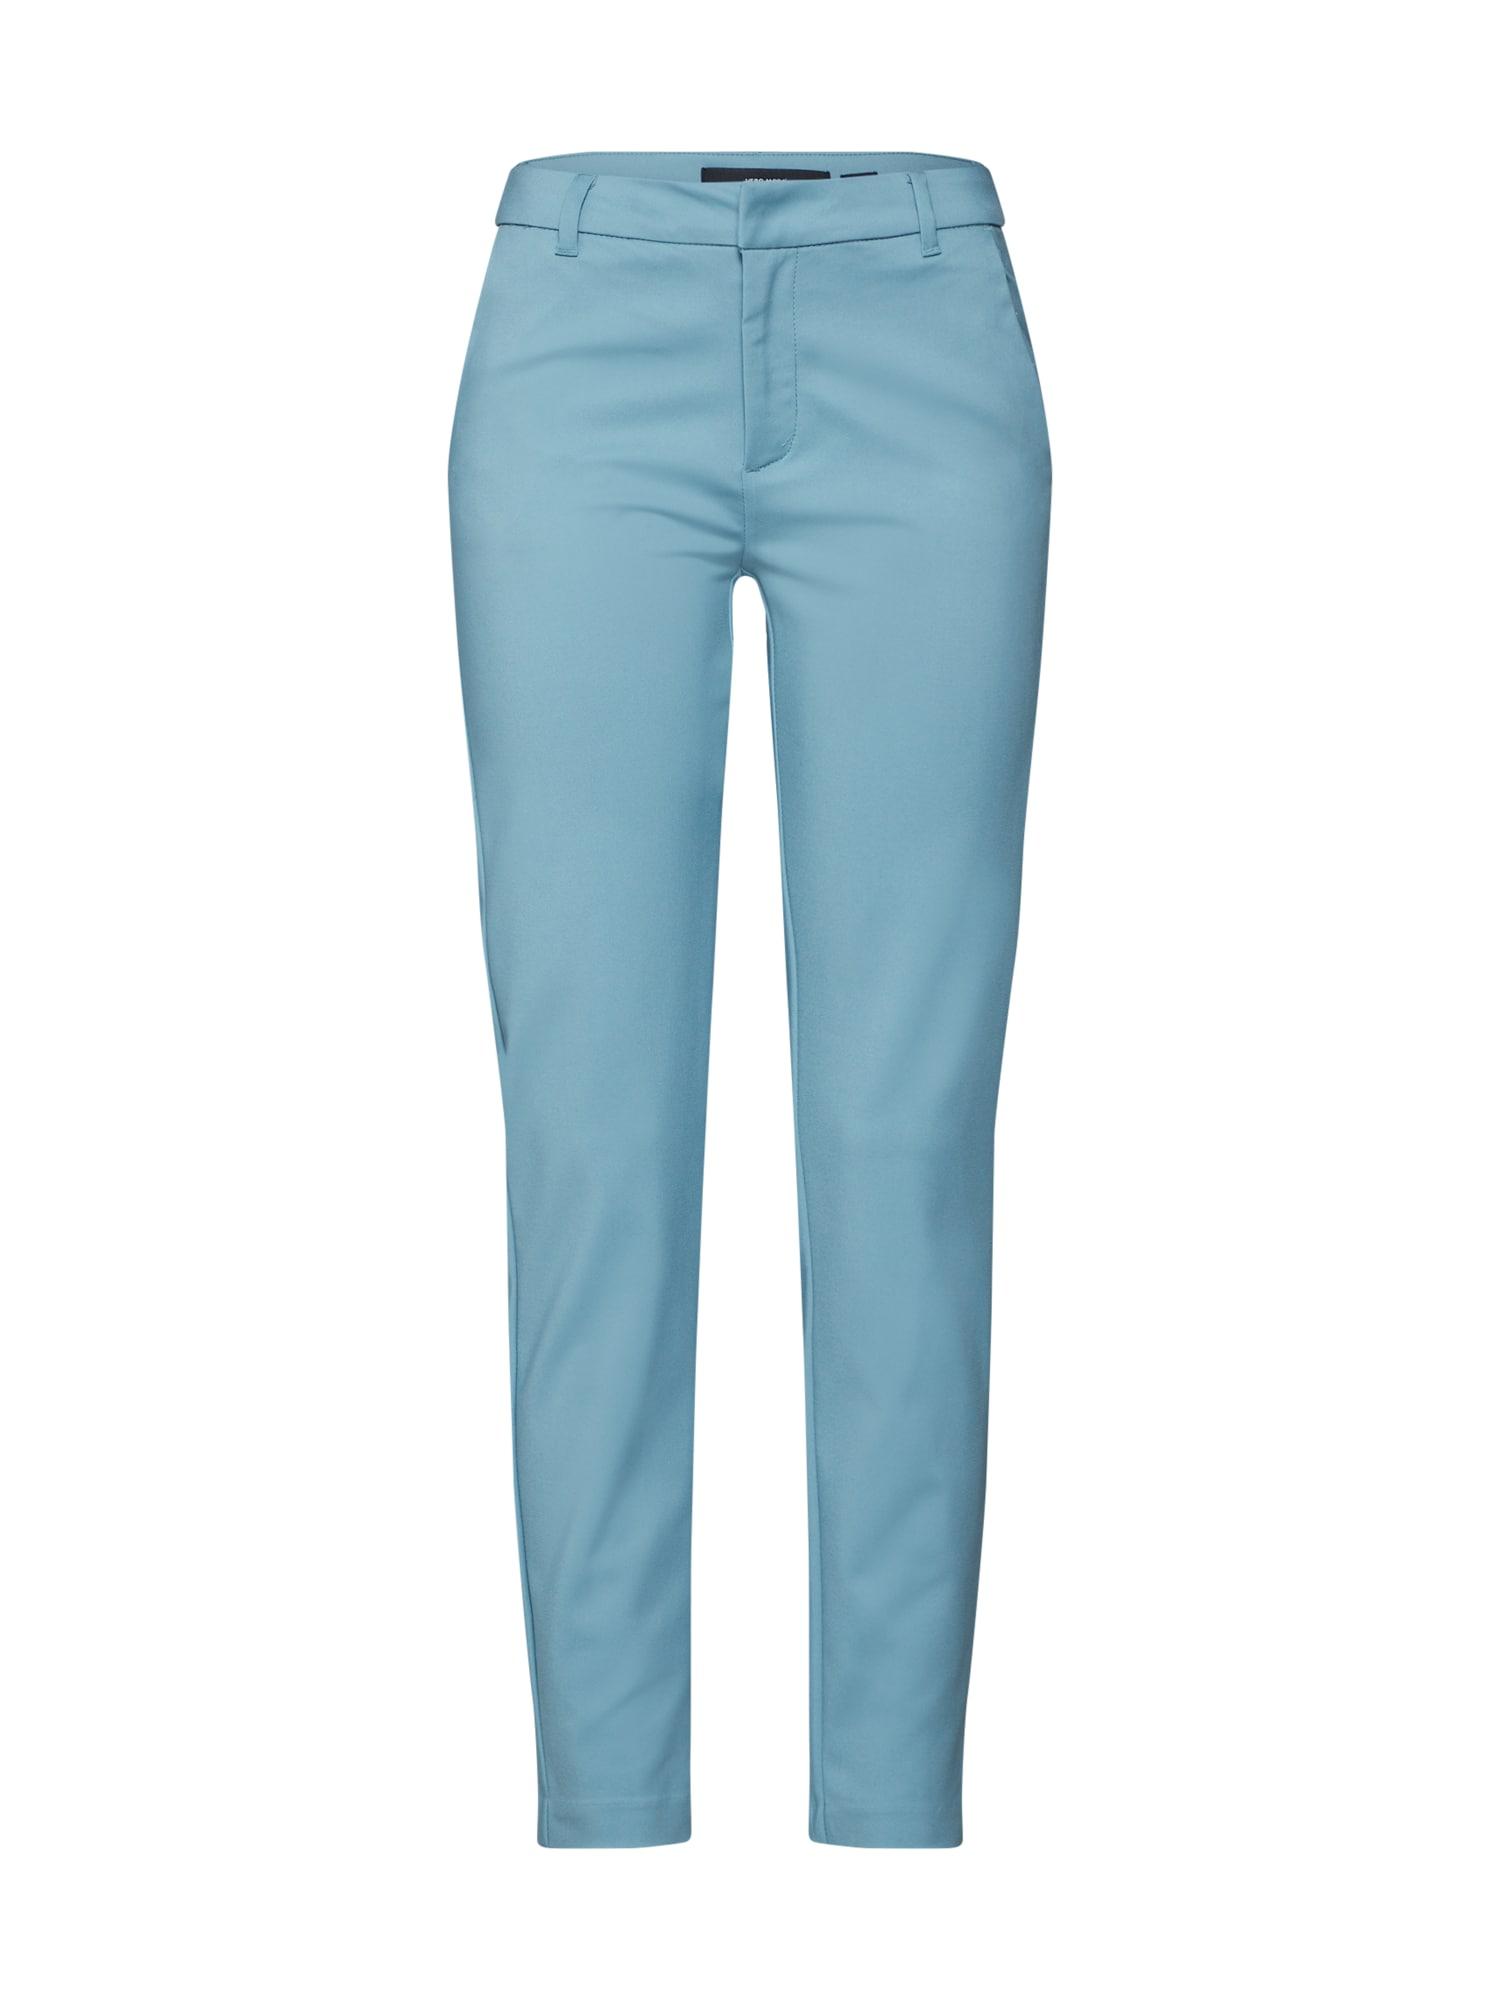 Kalhoty modrá světlemodrá VERO MODA